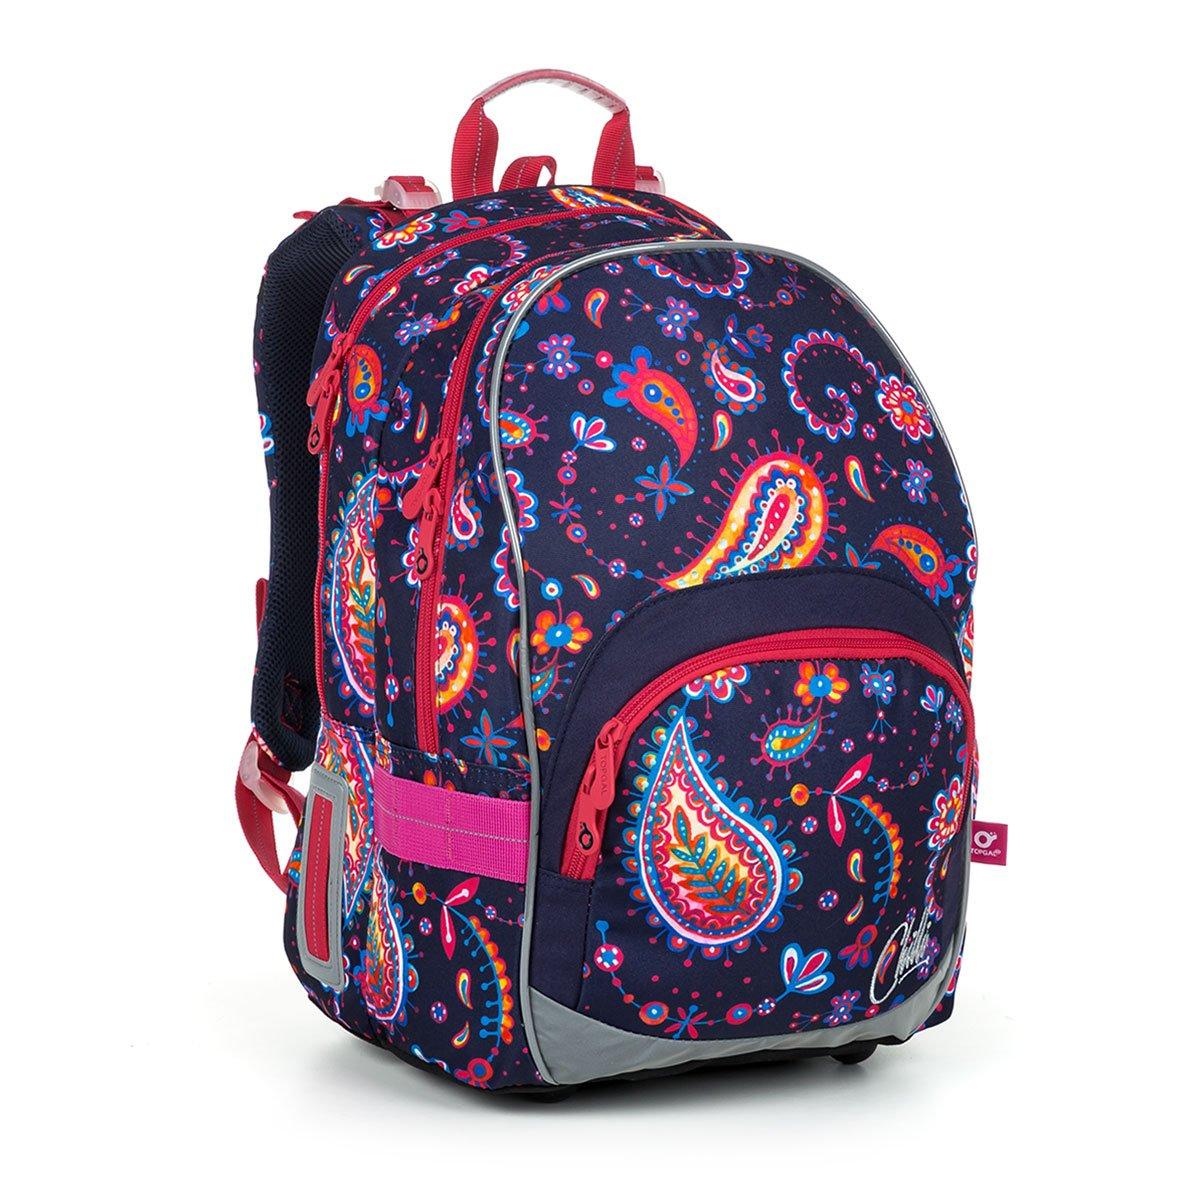 Školní batoh Topgal KIMI 19010 G